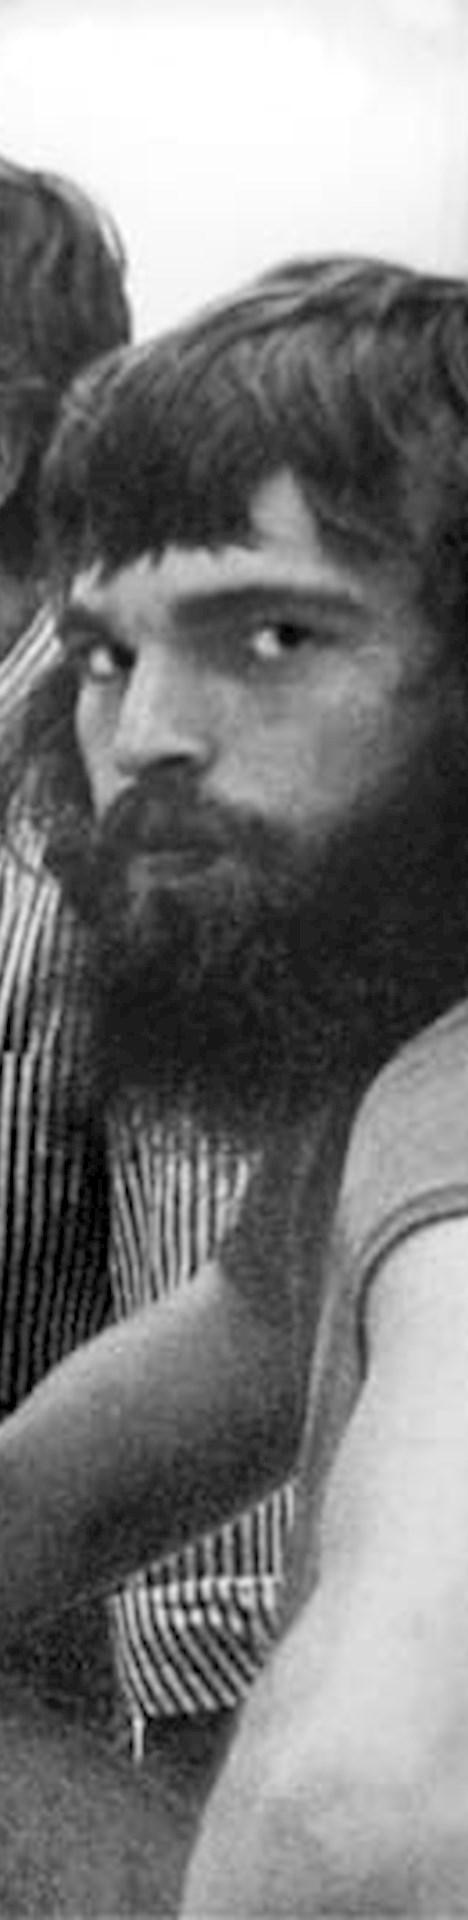 Brunel Gründer Jan Brand